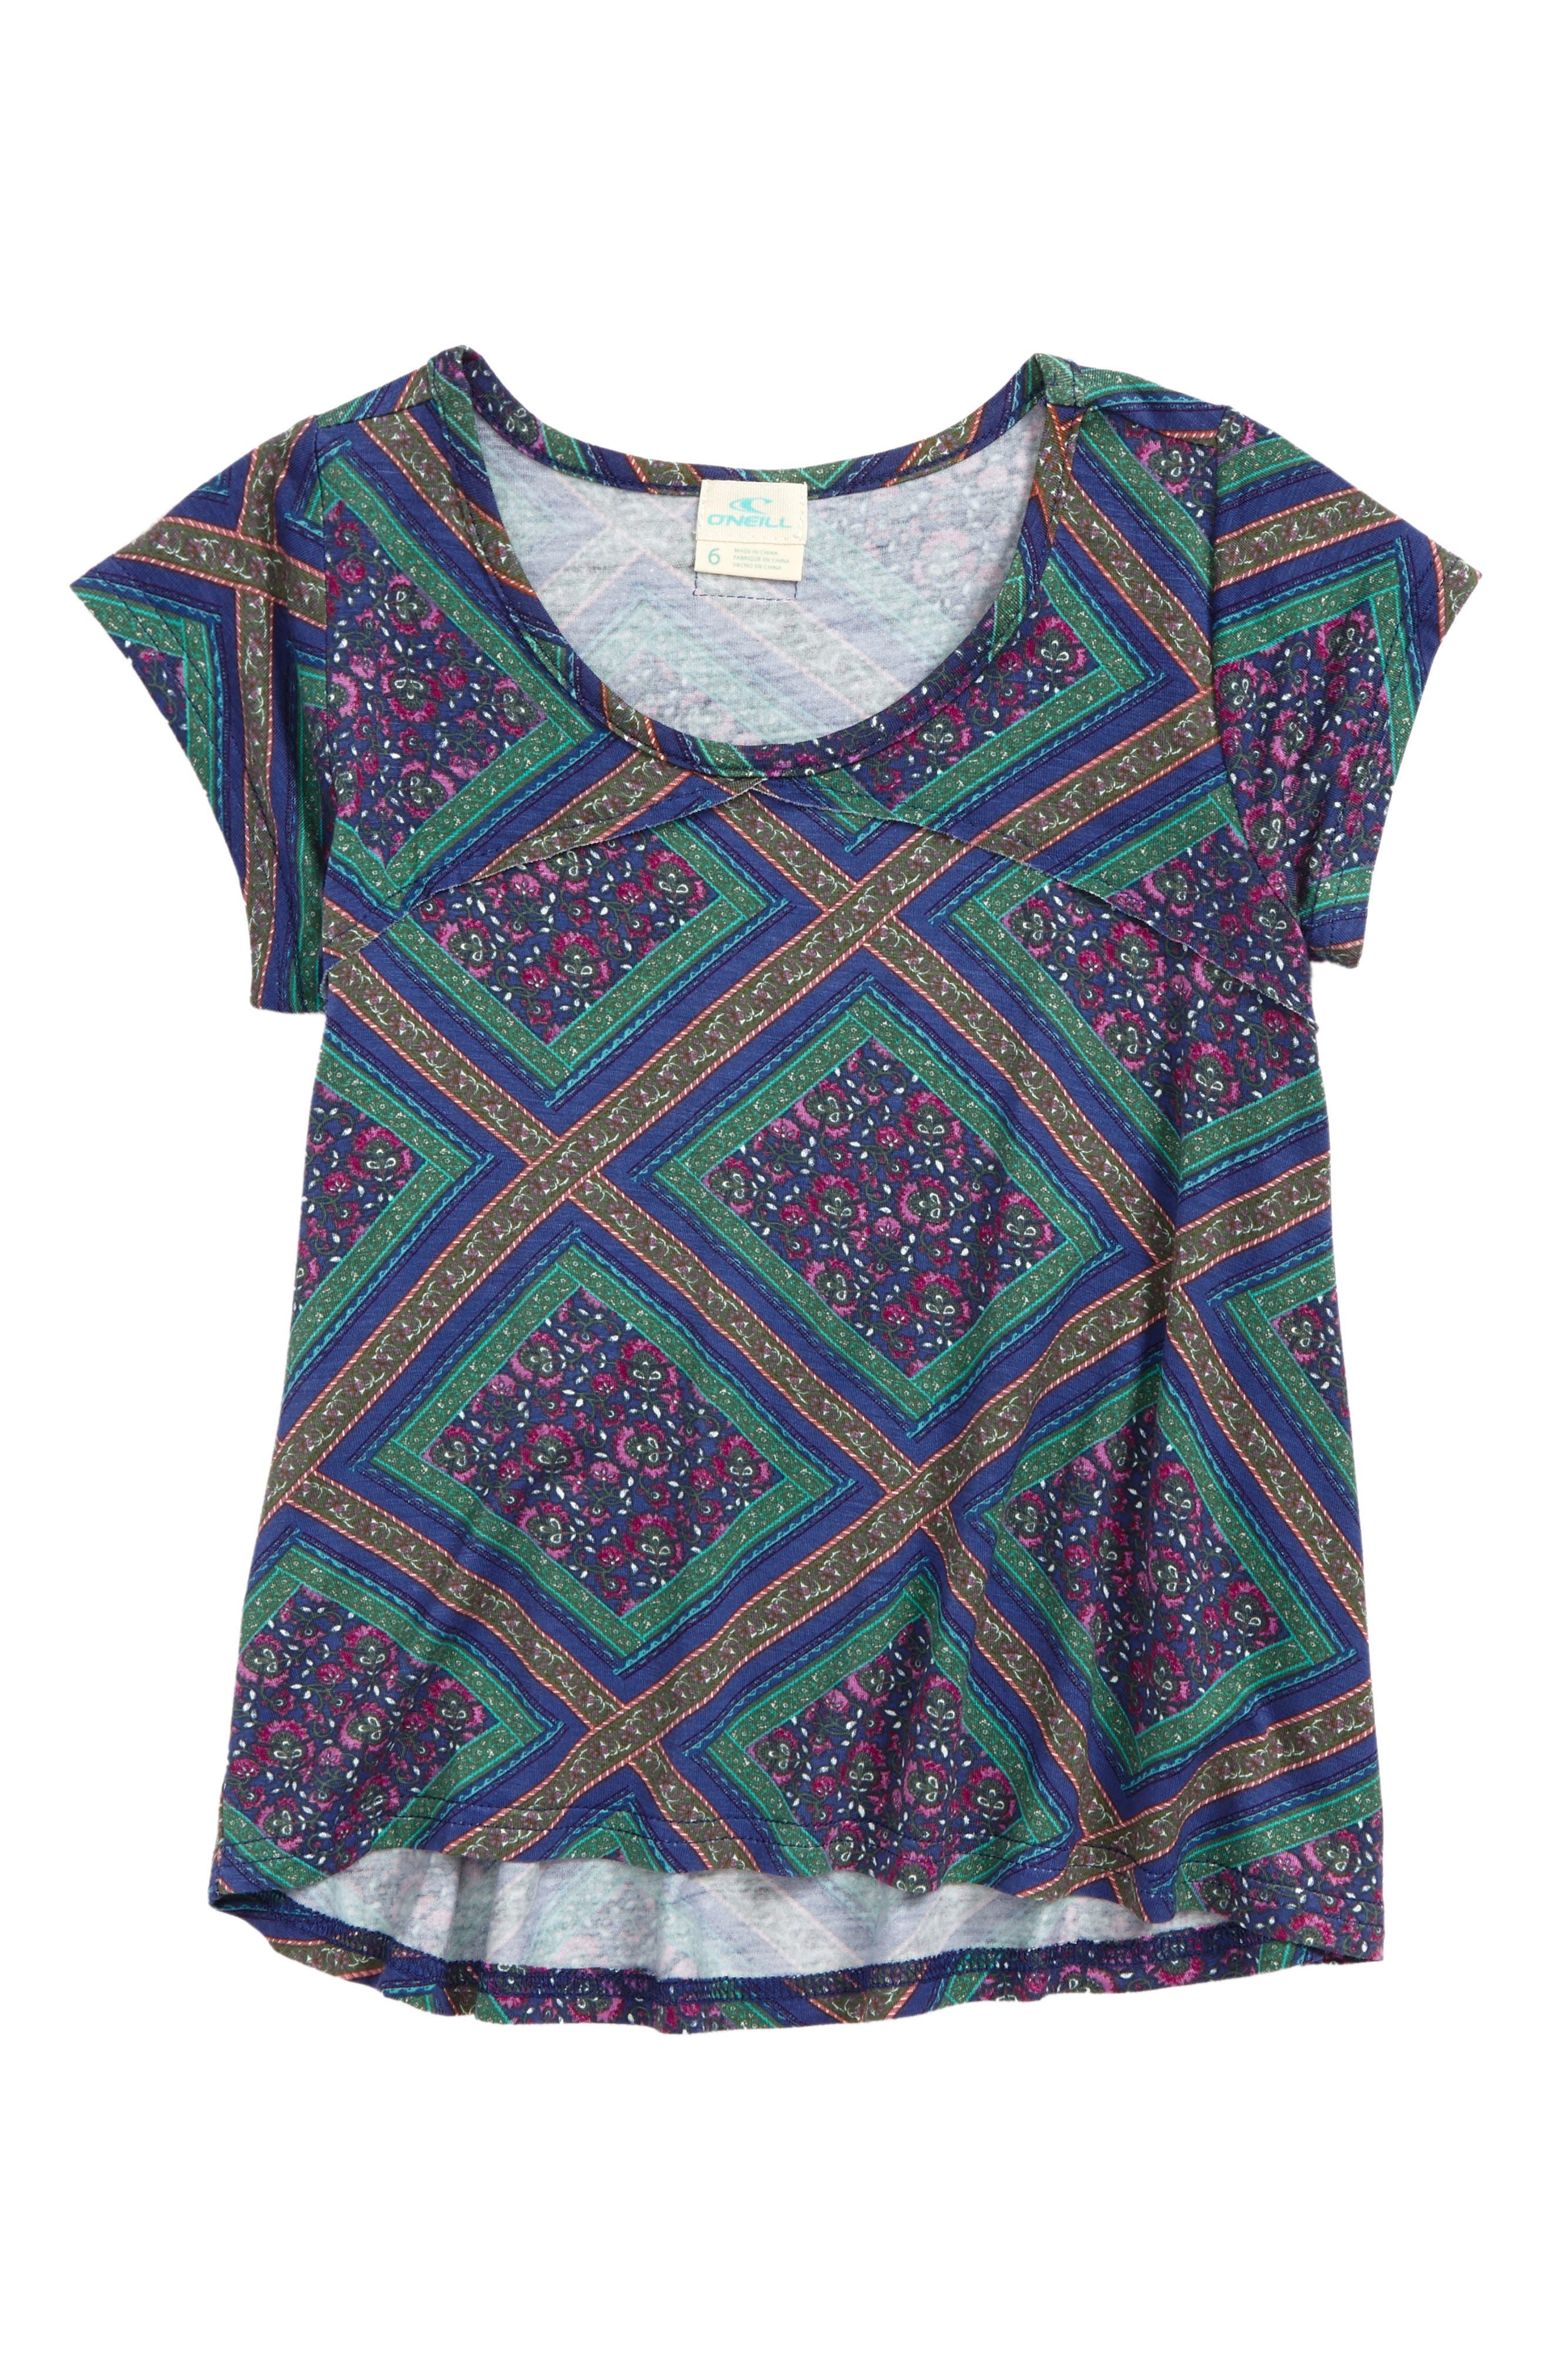 Emery Knit Top,                             Main thumbnail 1, color,                             408